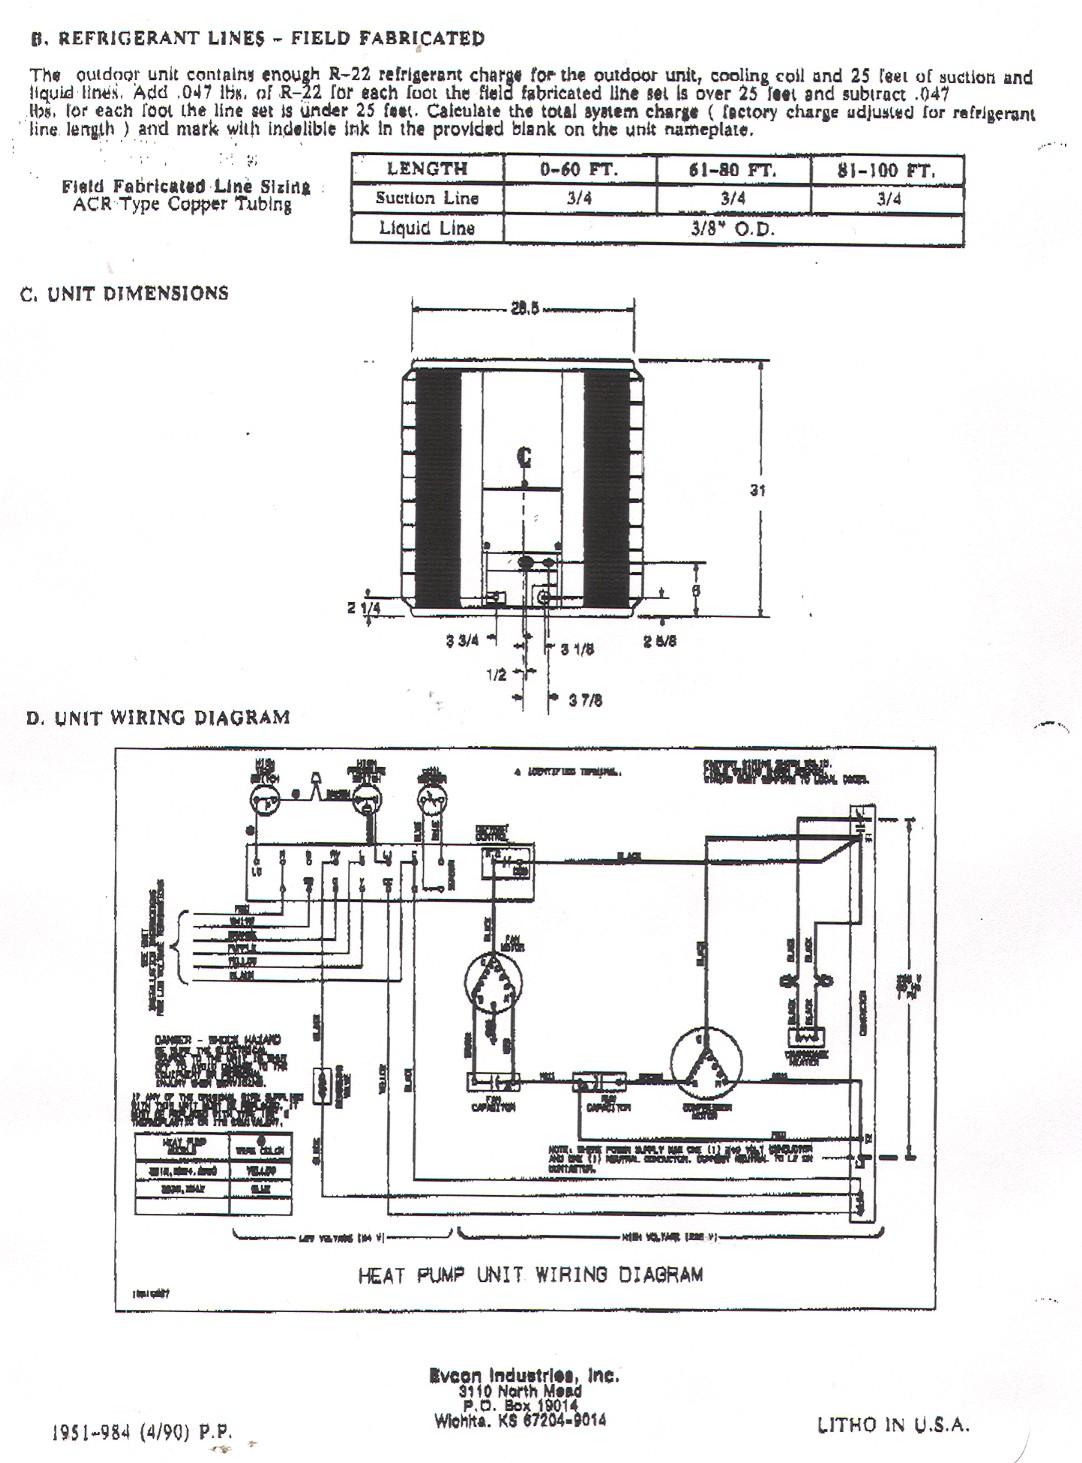 Electric Heat Pump Wiring Diagram   Wiring Diagram - Heat Pump Wiring Diagram Schematic